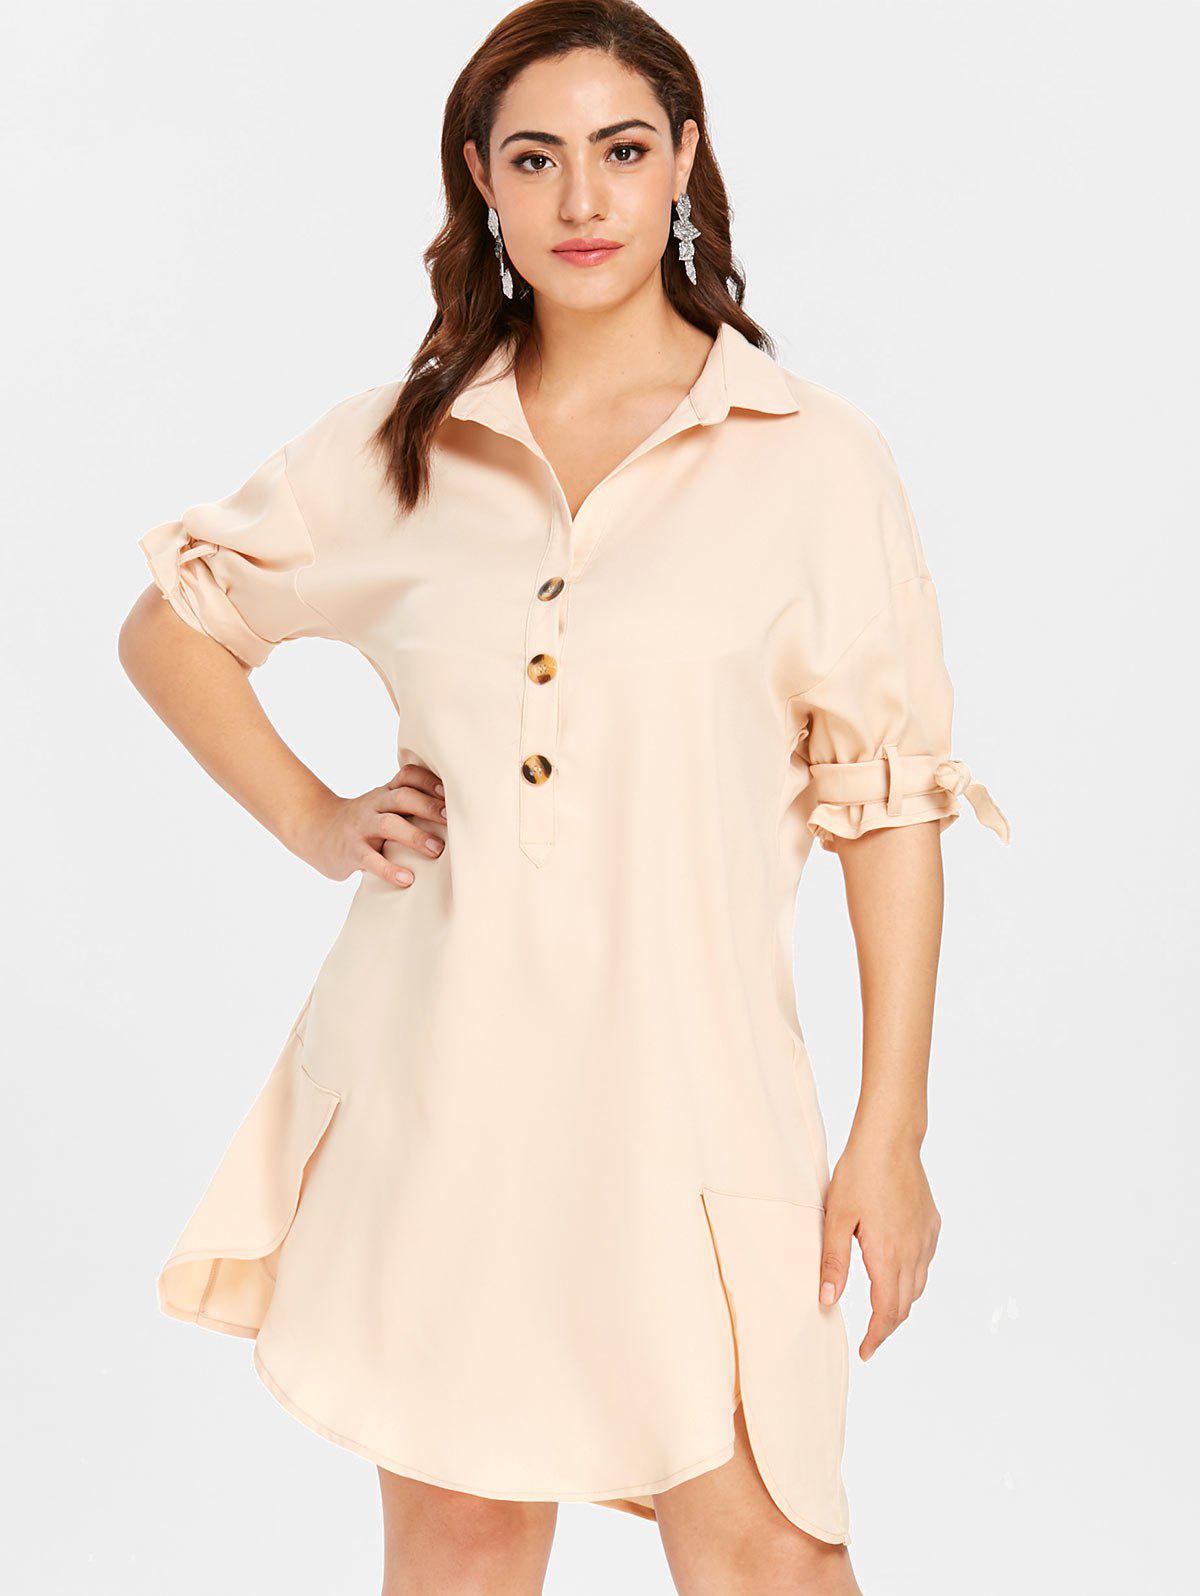 ZAFUL Plus Size Shift Buttoned Shirt Dress, Blanched almond